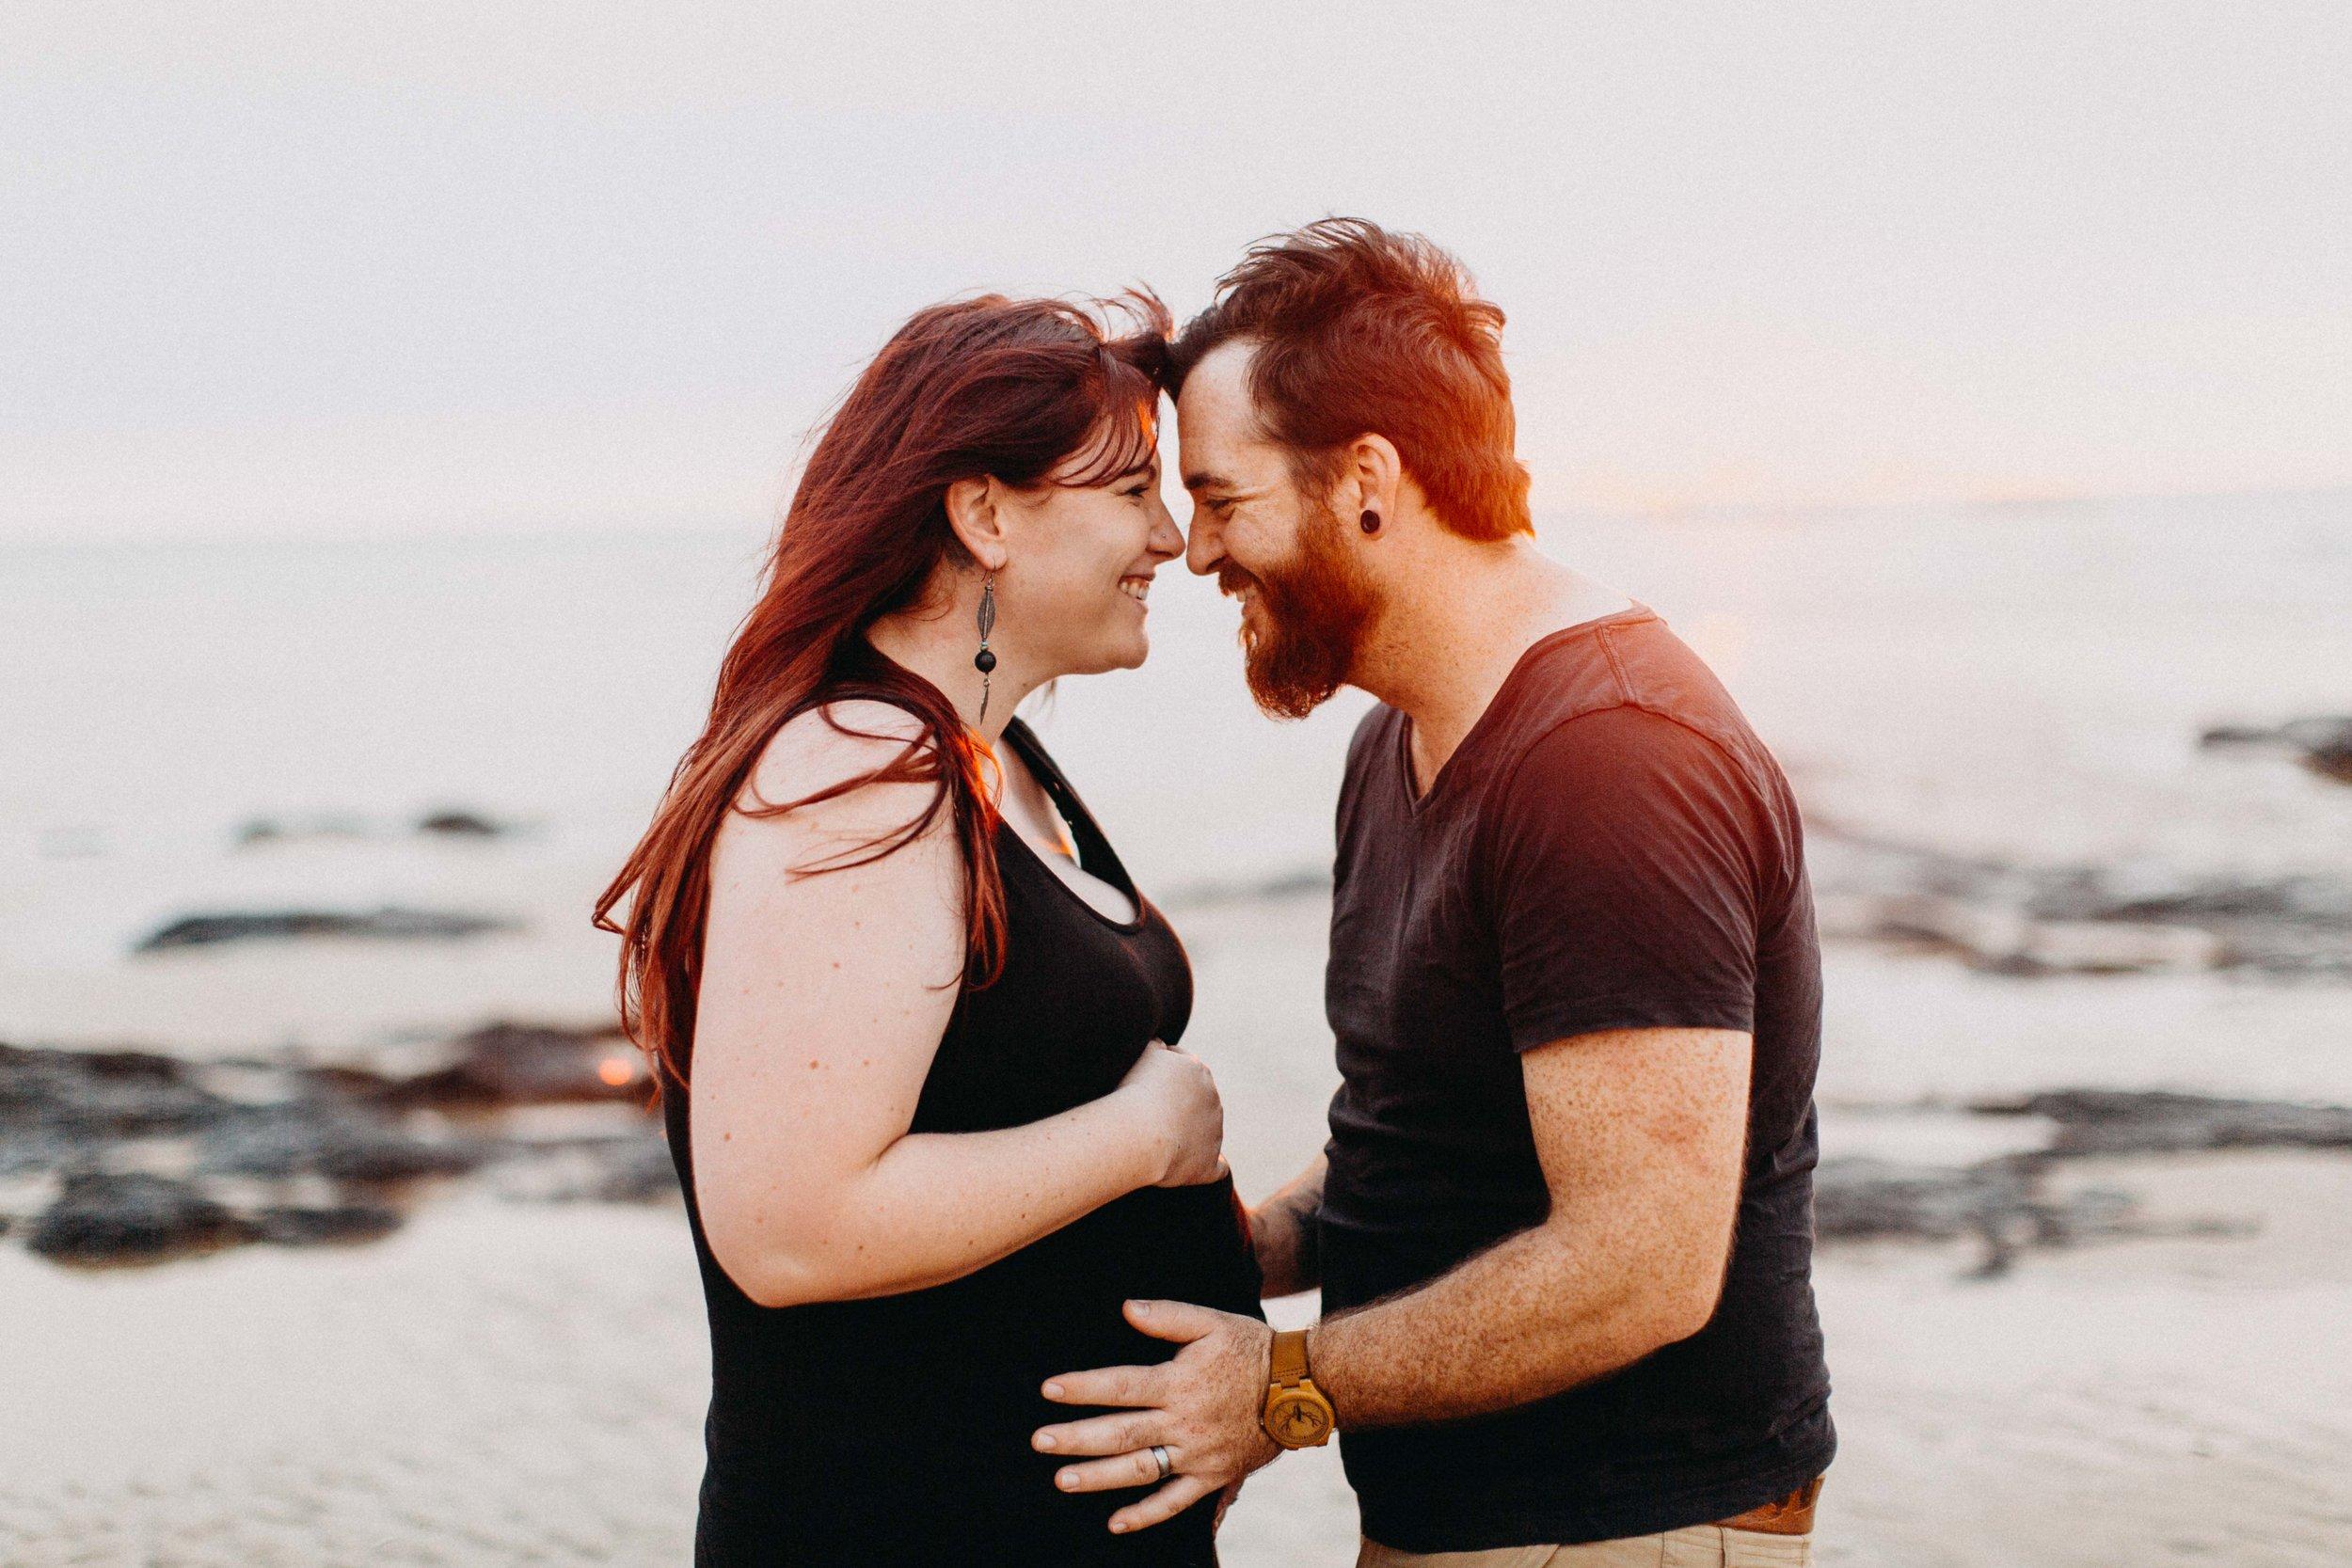 darwin-maternity-session-www.emilyobrienphotography.net-29.jpg